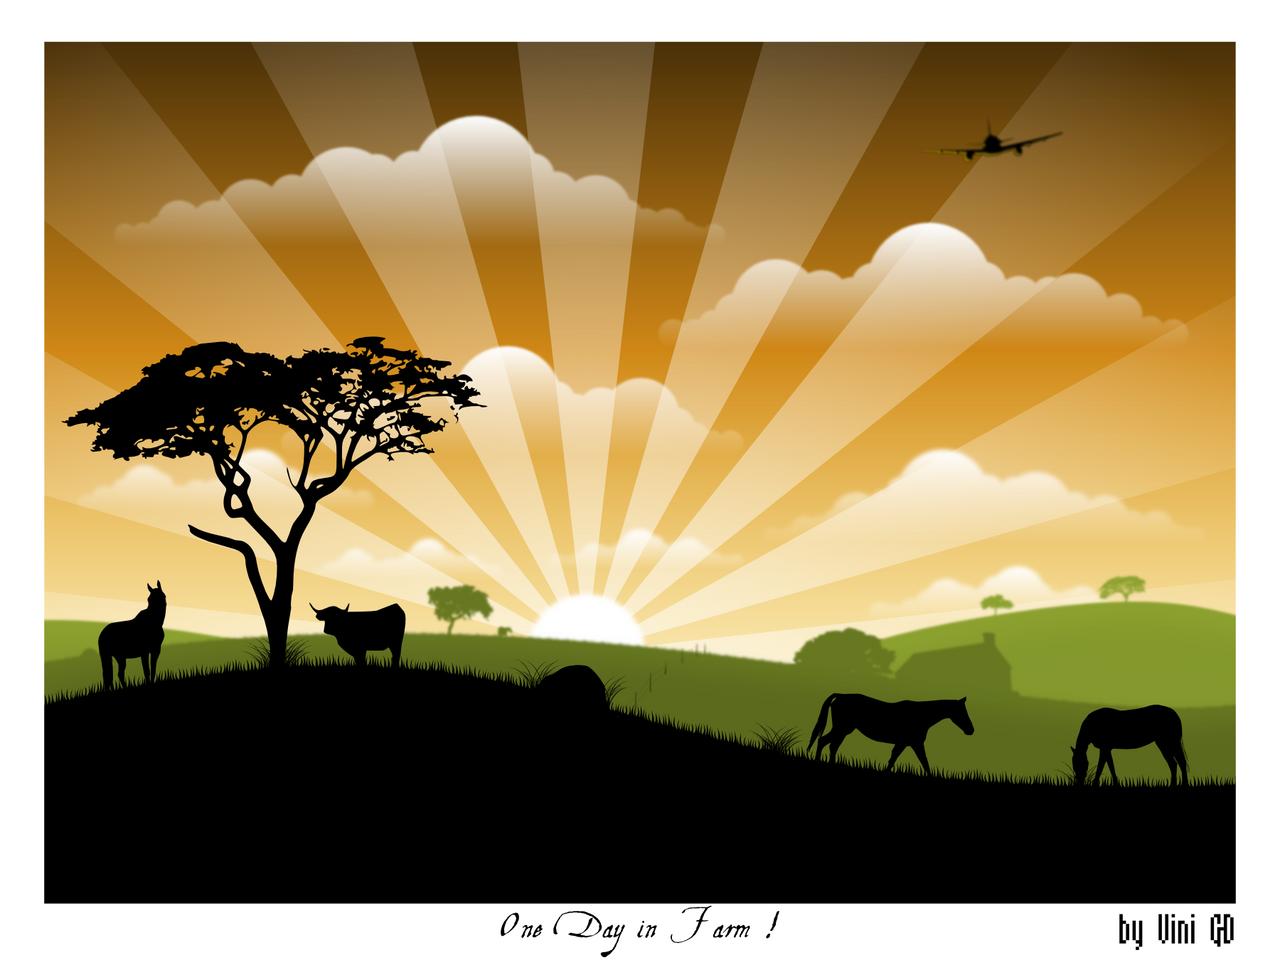 One Day in Farm by RebirthArt